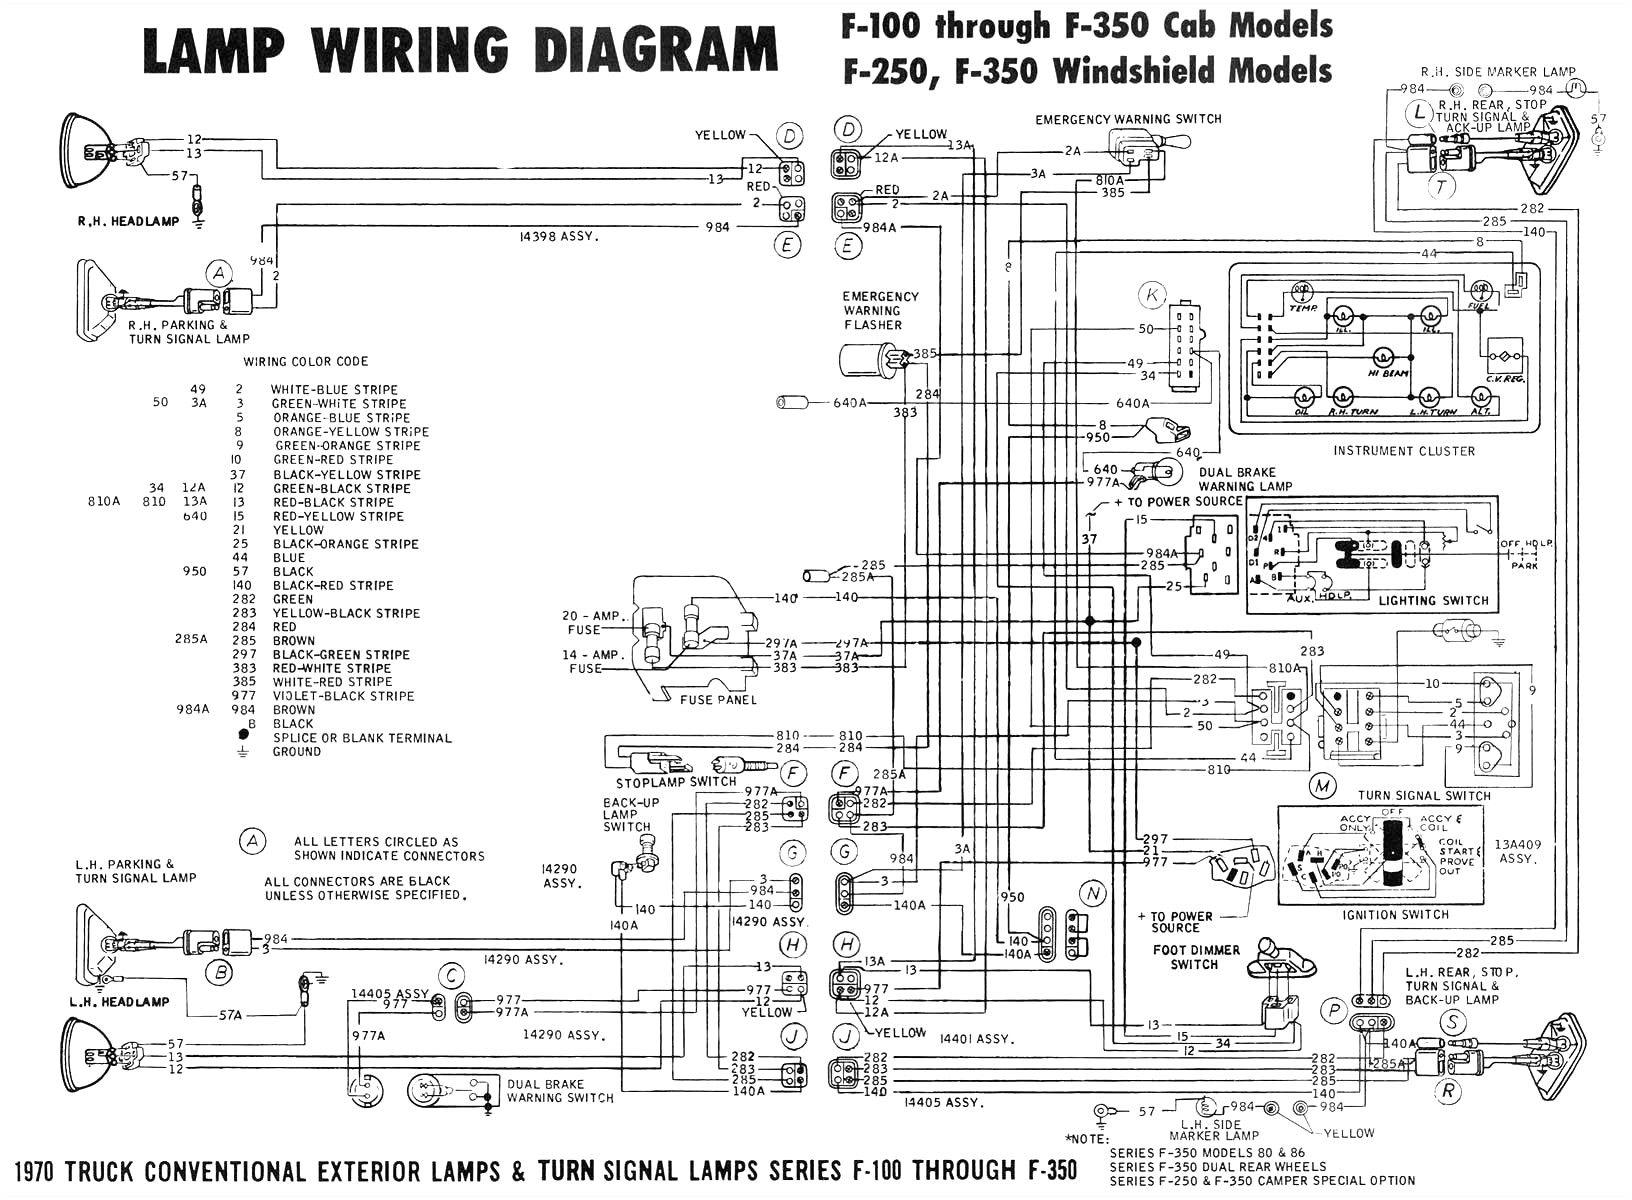 DIAGRAM] Yamaha F350 Command Link Wiring Diagram FULL Version HD Quality Wiring  Diagram - WIRINGDUCT.AUTOFOLLOW.FRwiringduct.autofollow.fr